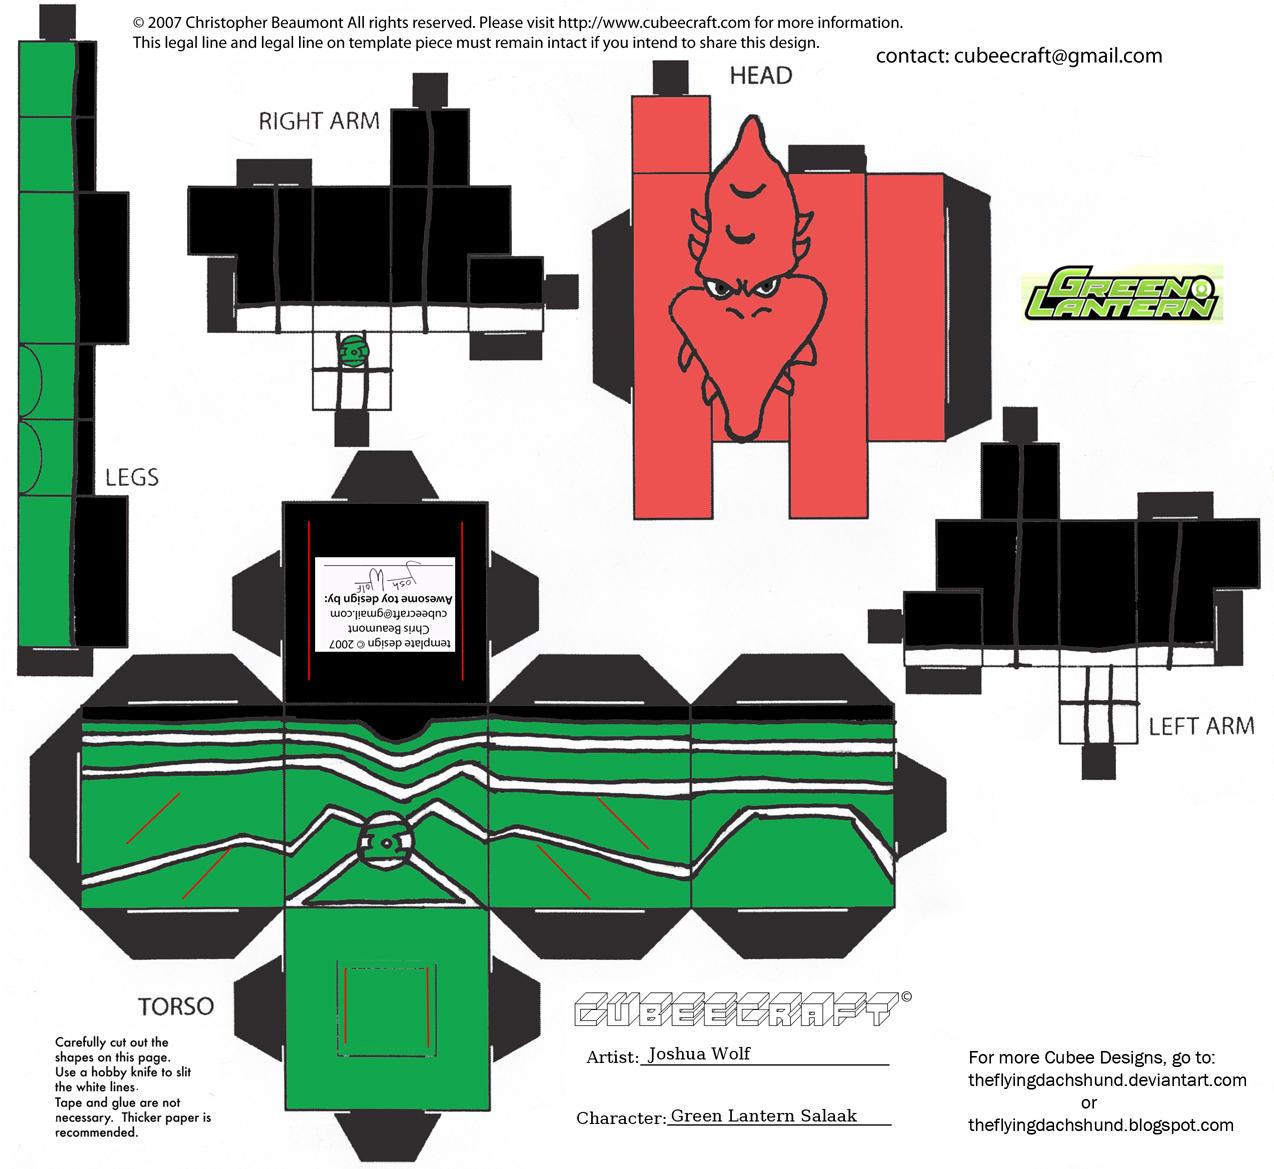 GL 3: Salaak Cubee by TheFlyingDachshund